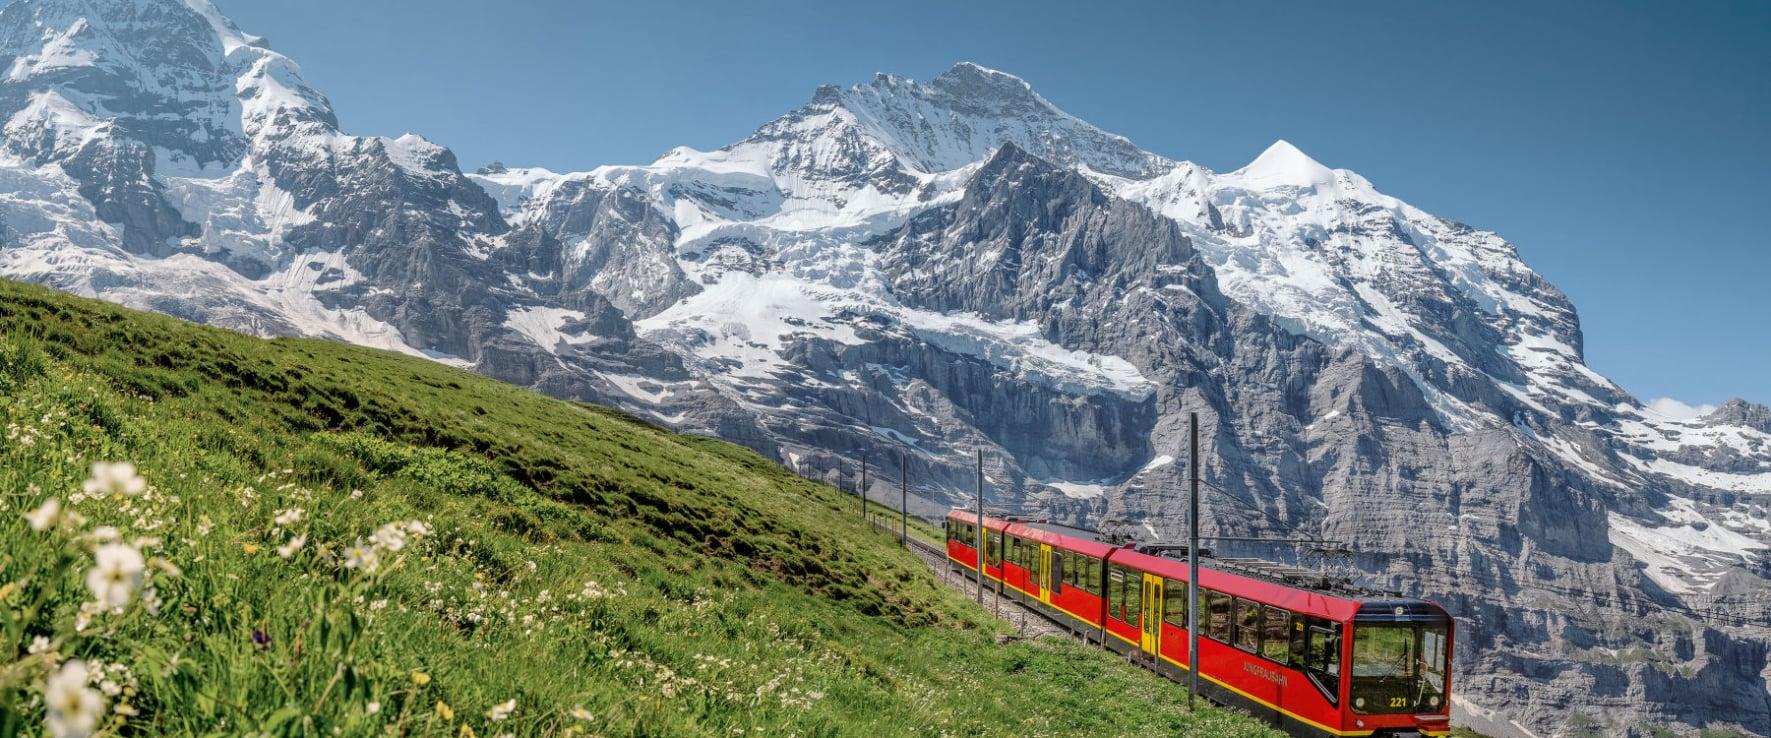 Asia Jungfrau